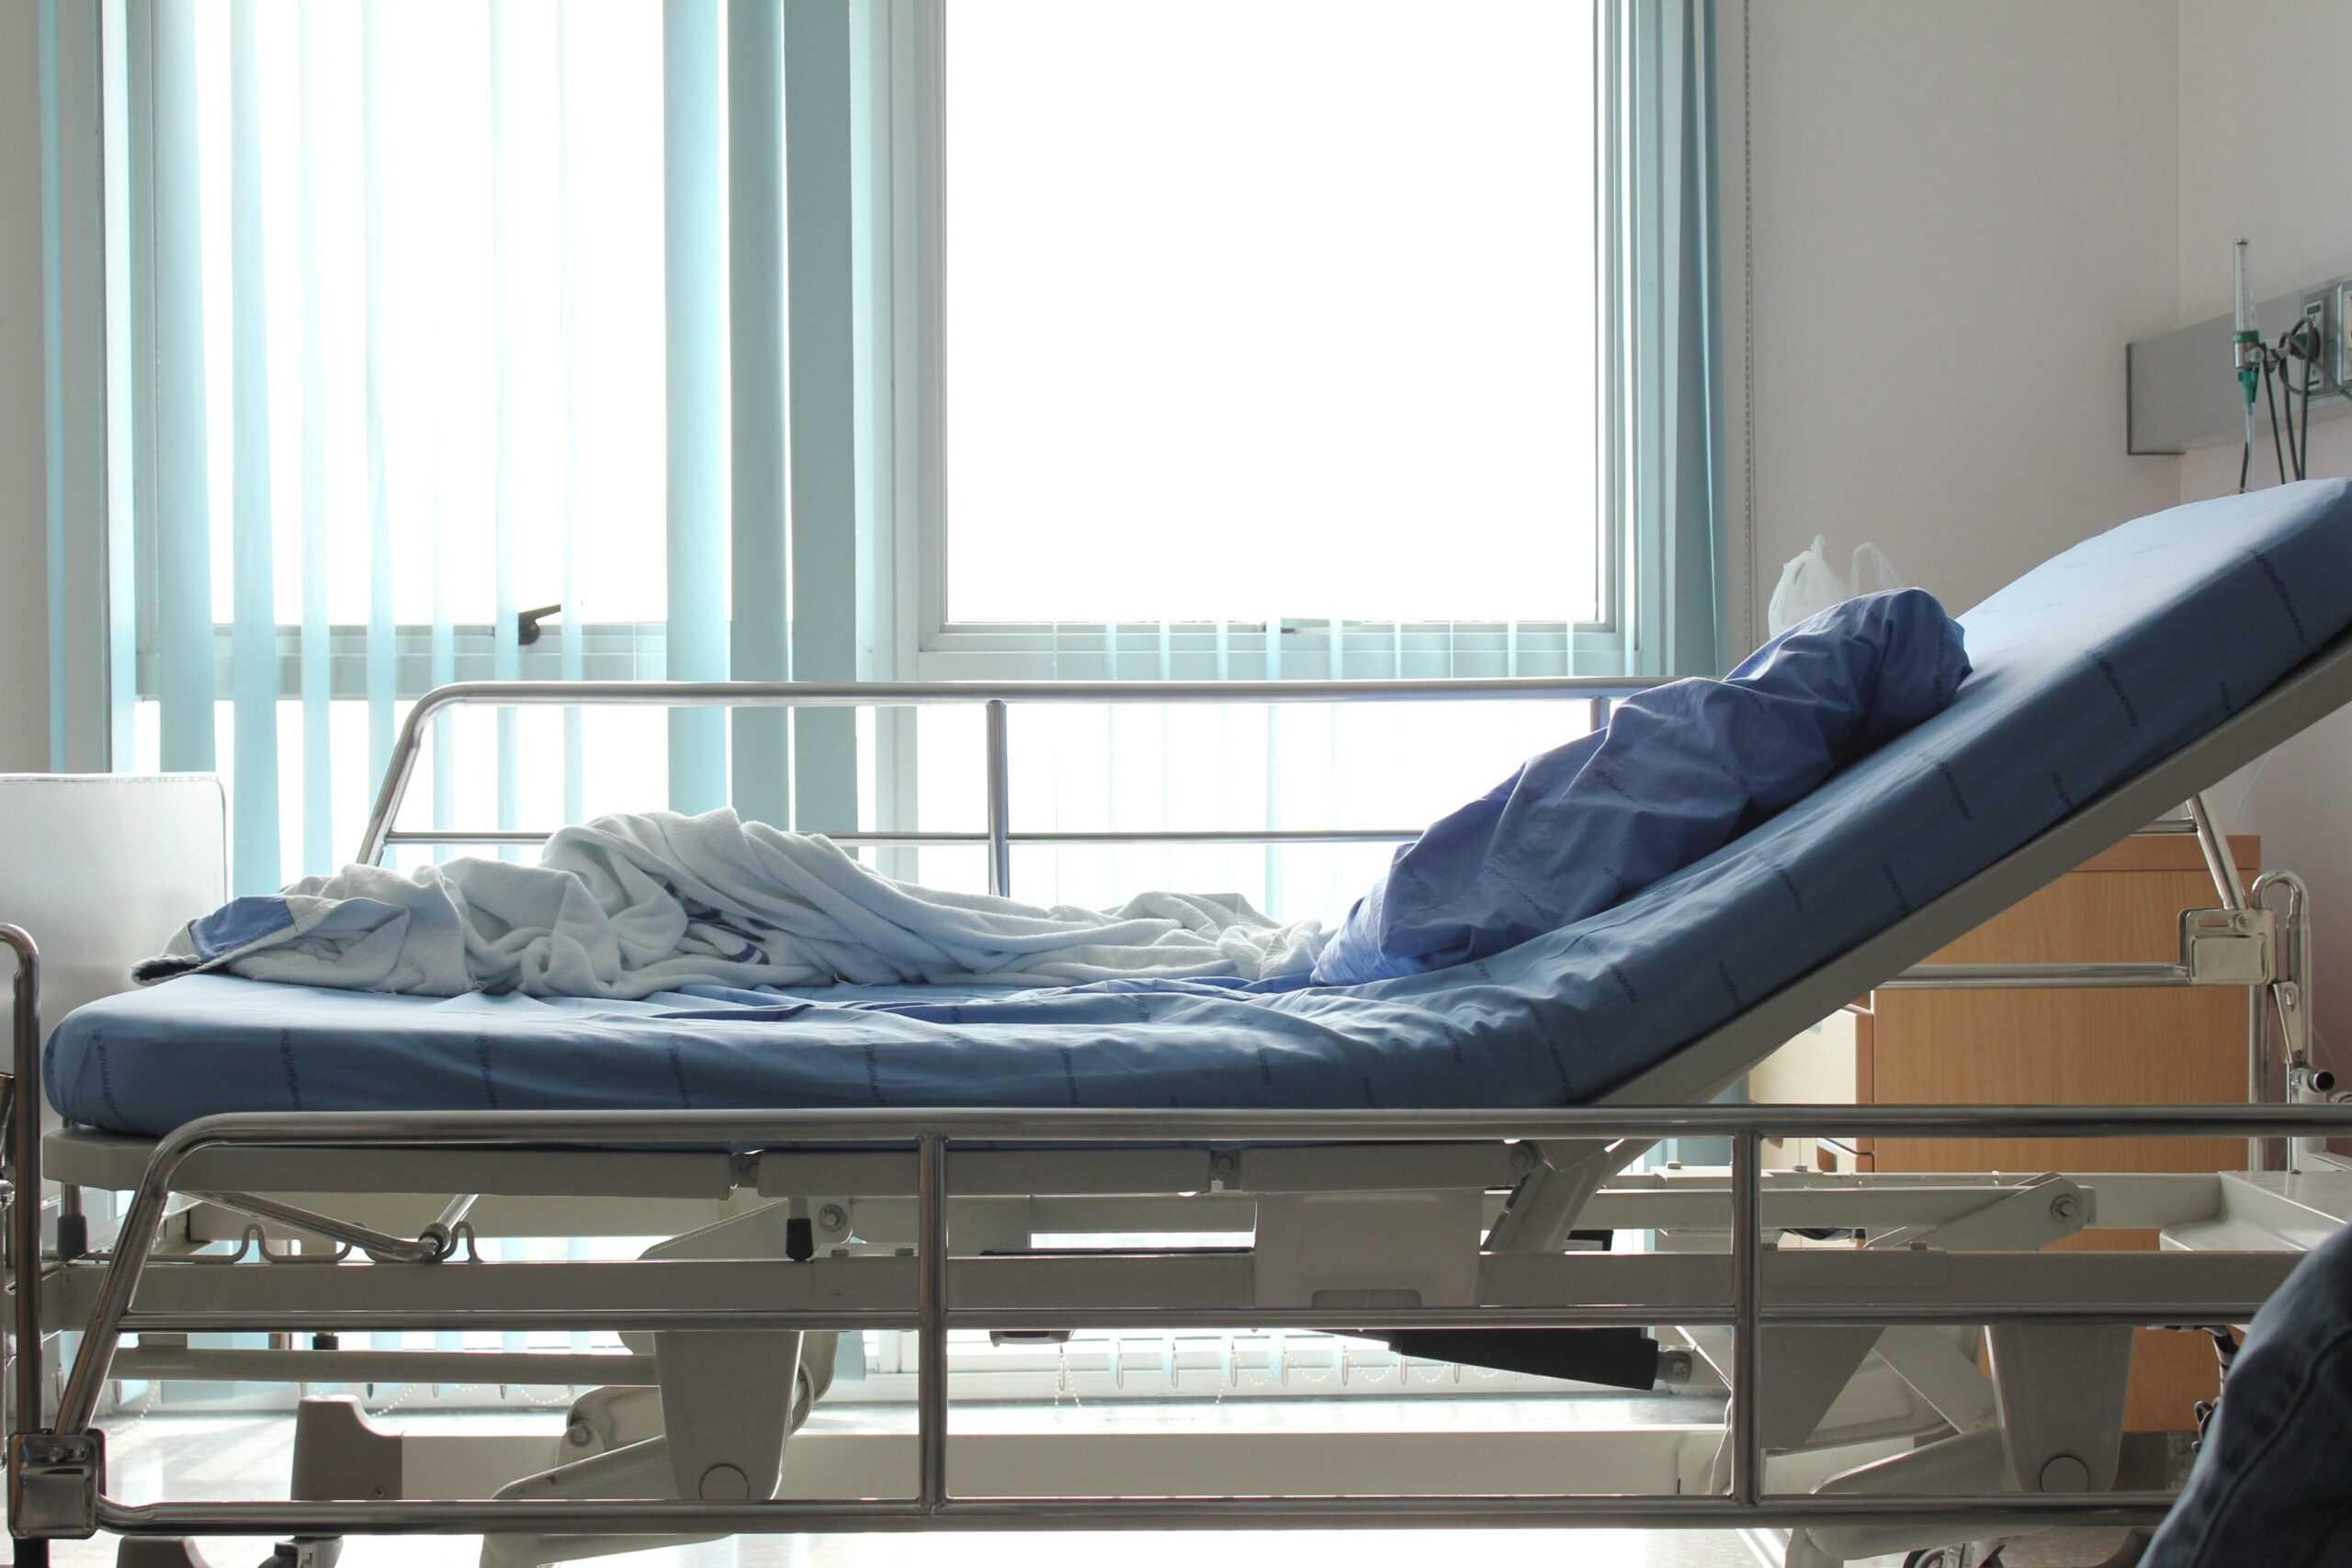 Hospital-Bed-Shortage